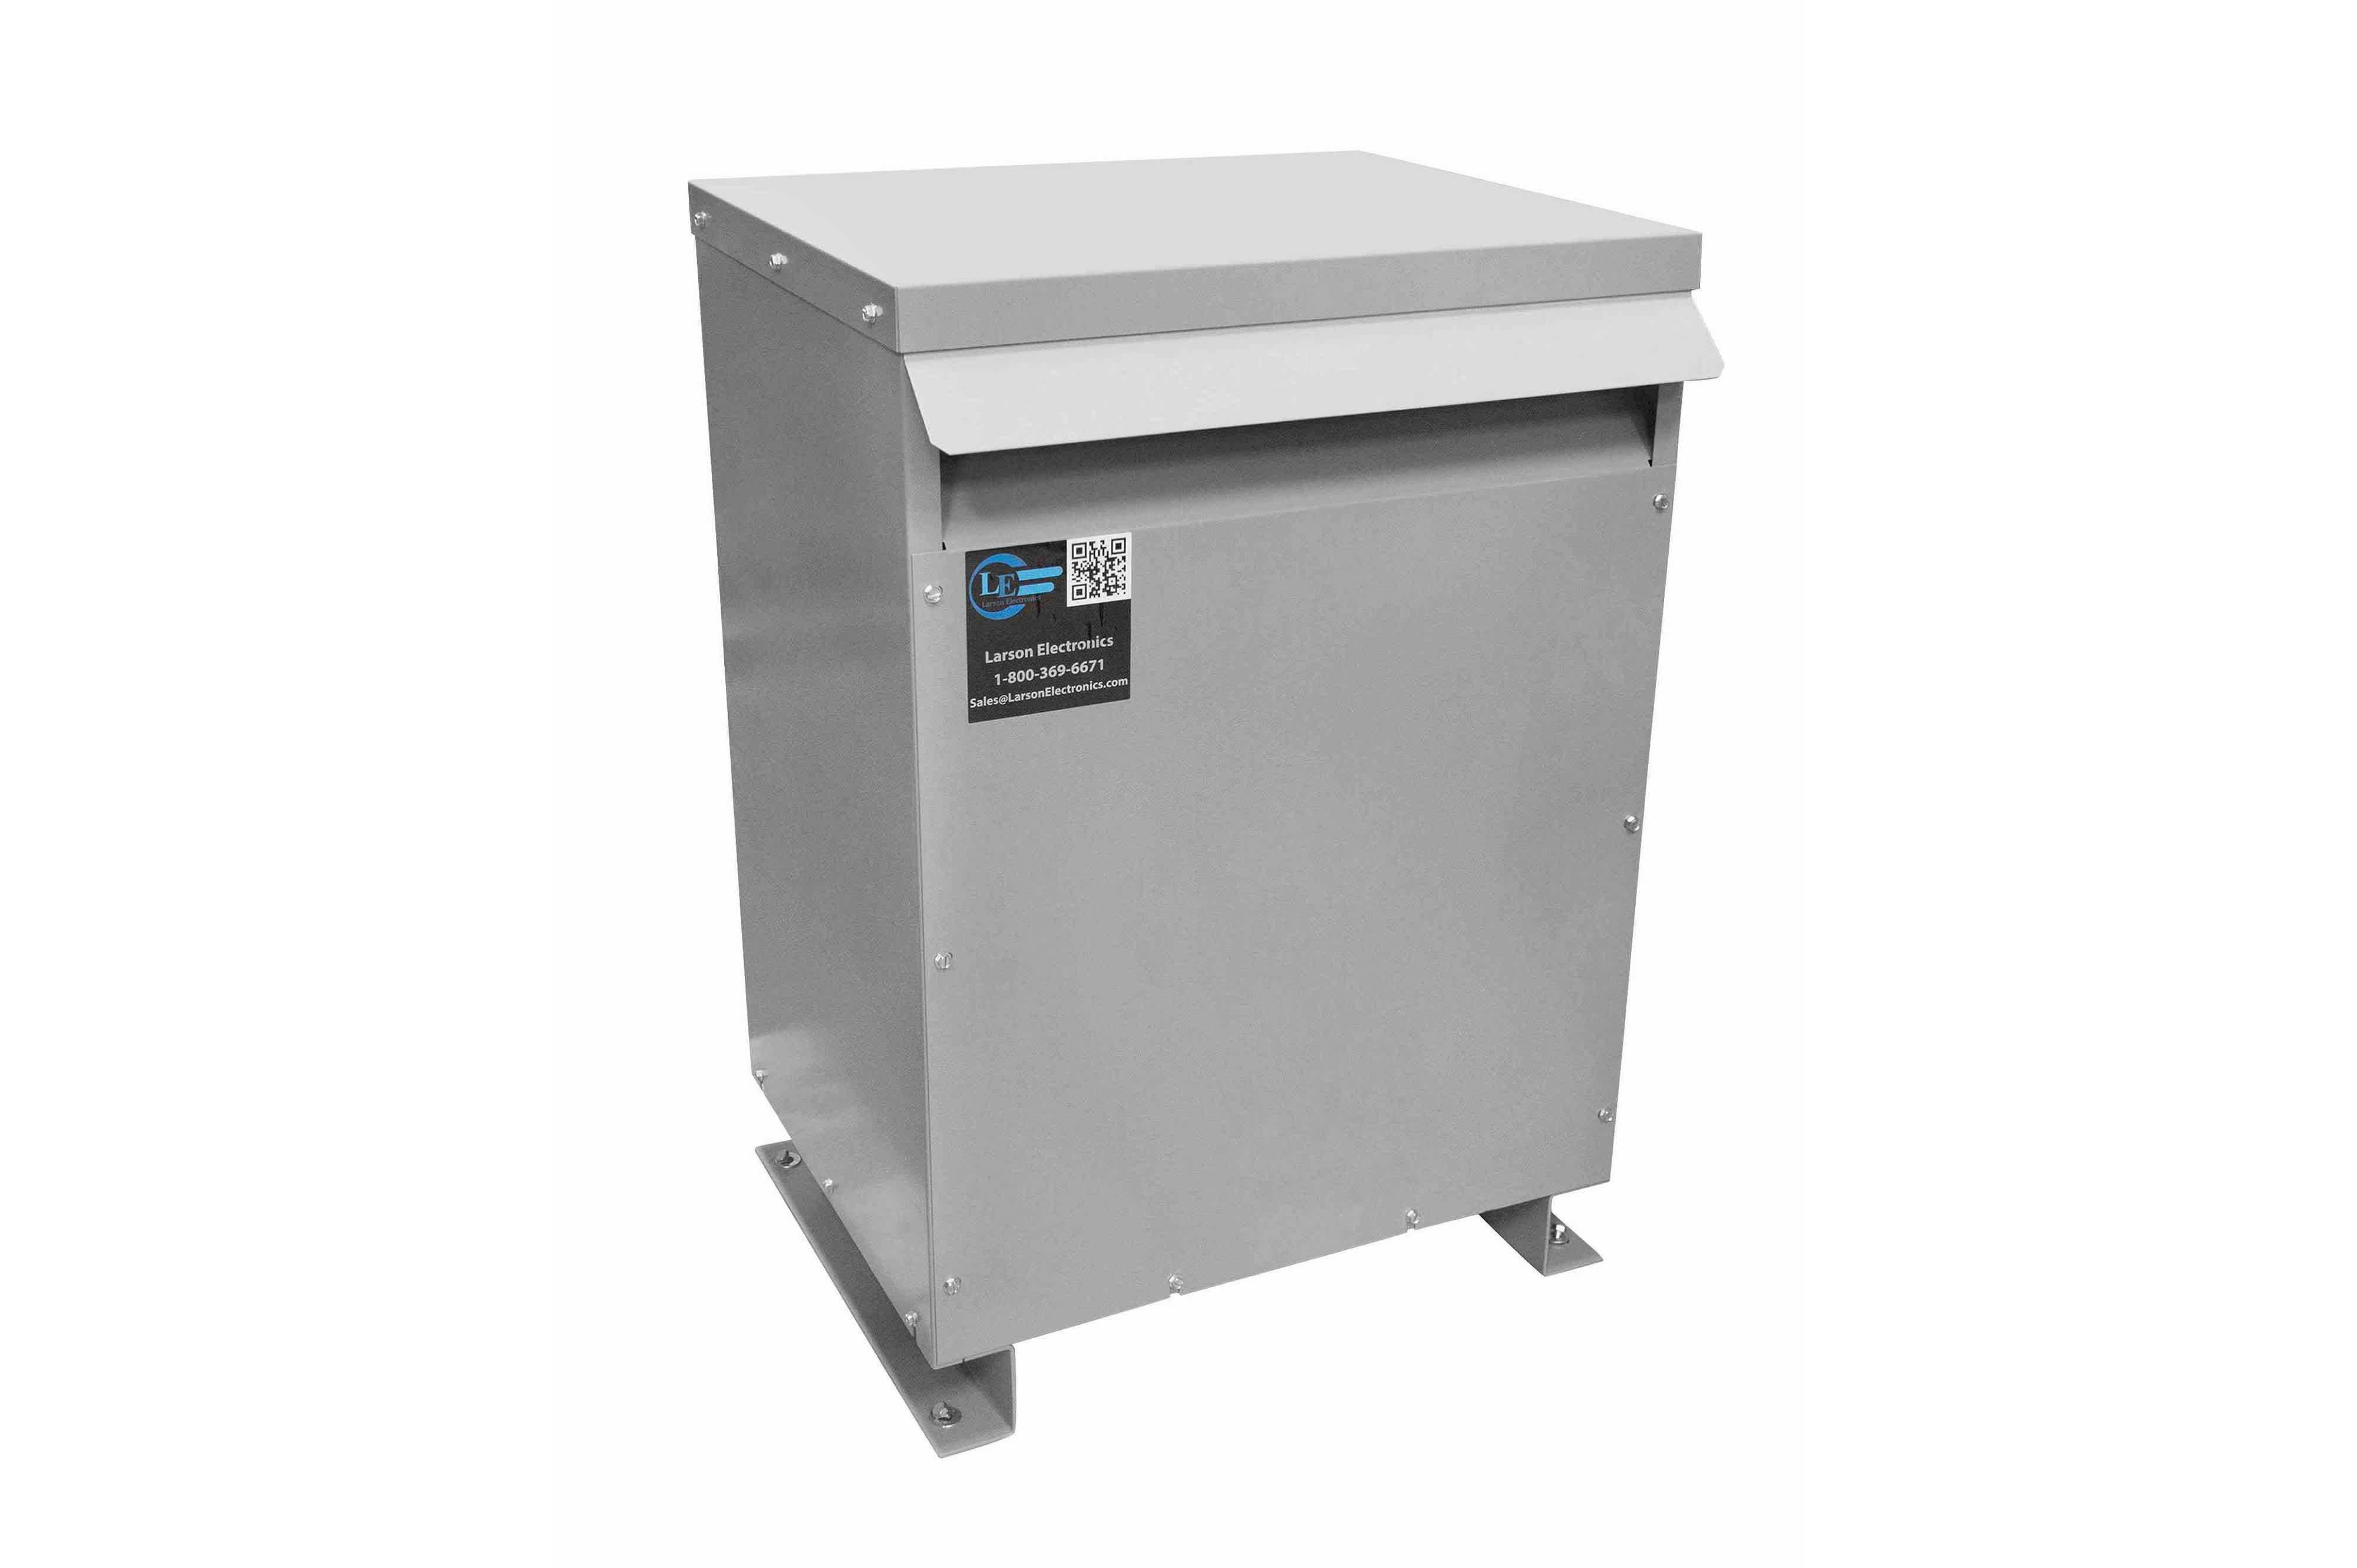 65 kVA 3PH Isolation Transformer, 208V Wye Primary, 380Y/220 Wye-N Secondary, N3R, Ventilated, 60 Hz